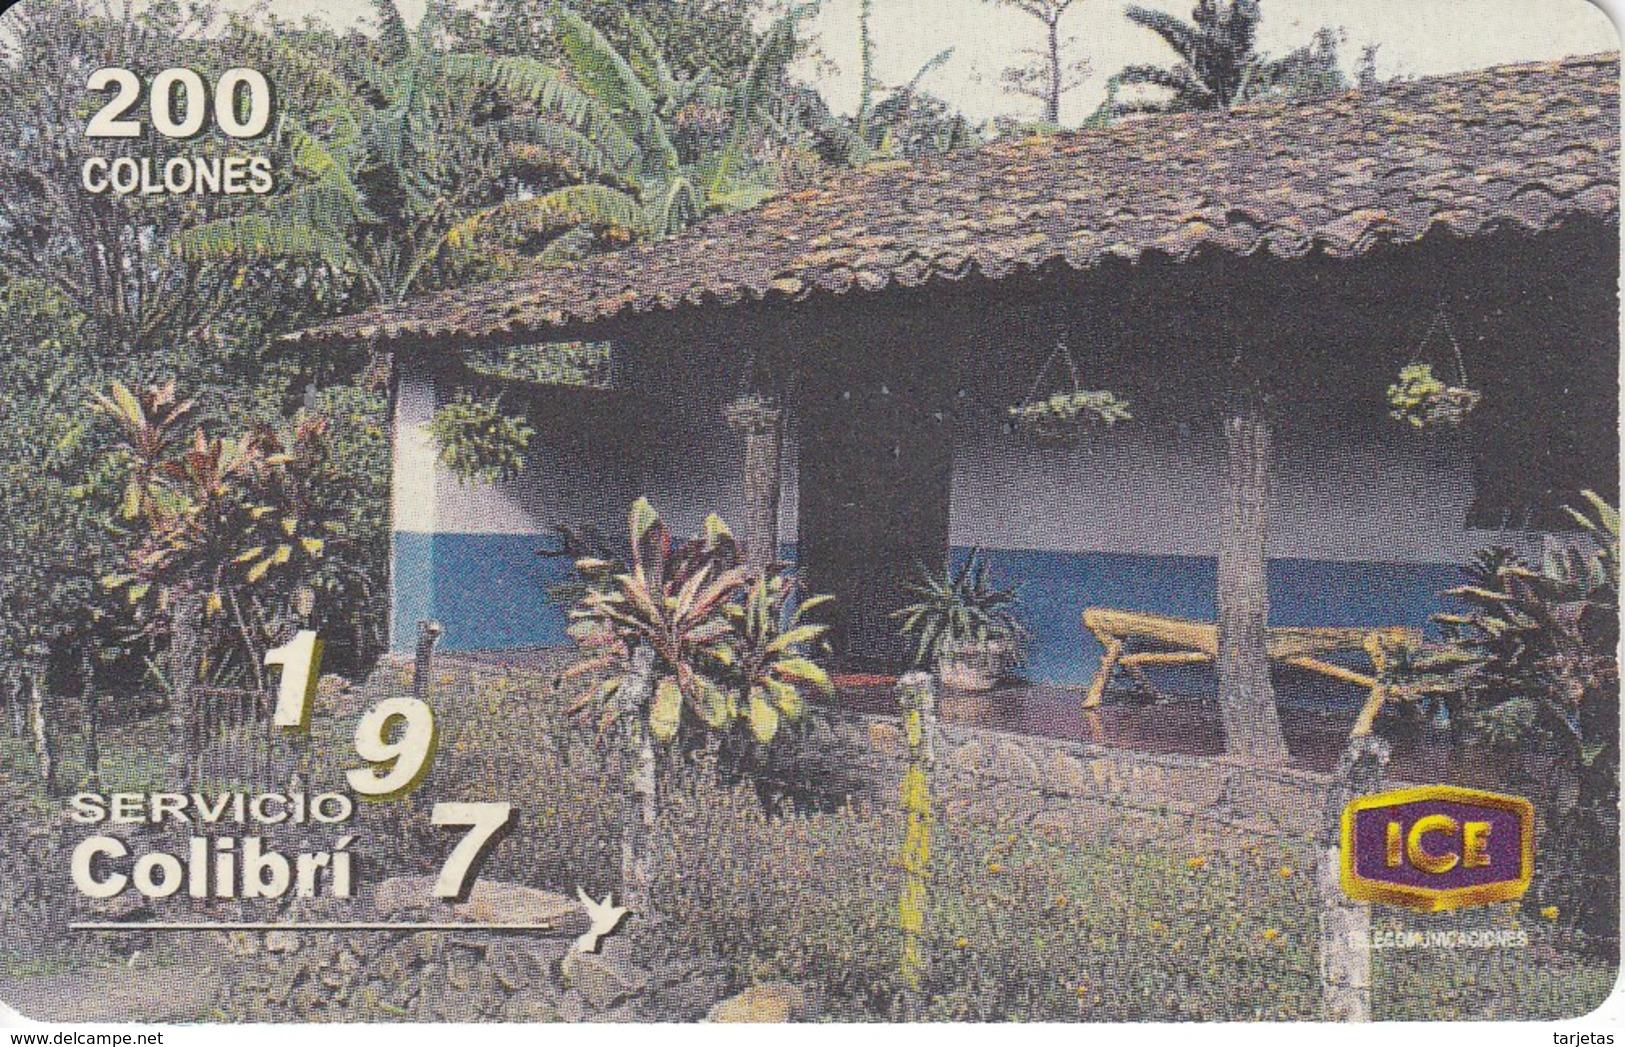 TARJETA DE COSTA RICA DE UNA CASONA TIPICA ESCAZU - Costa Rica